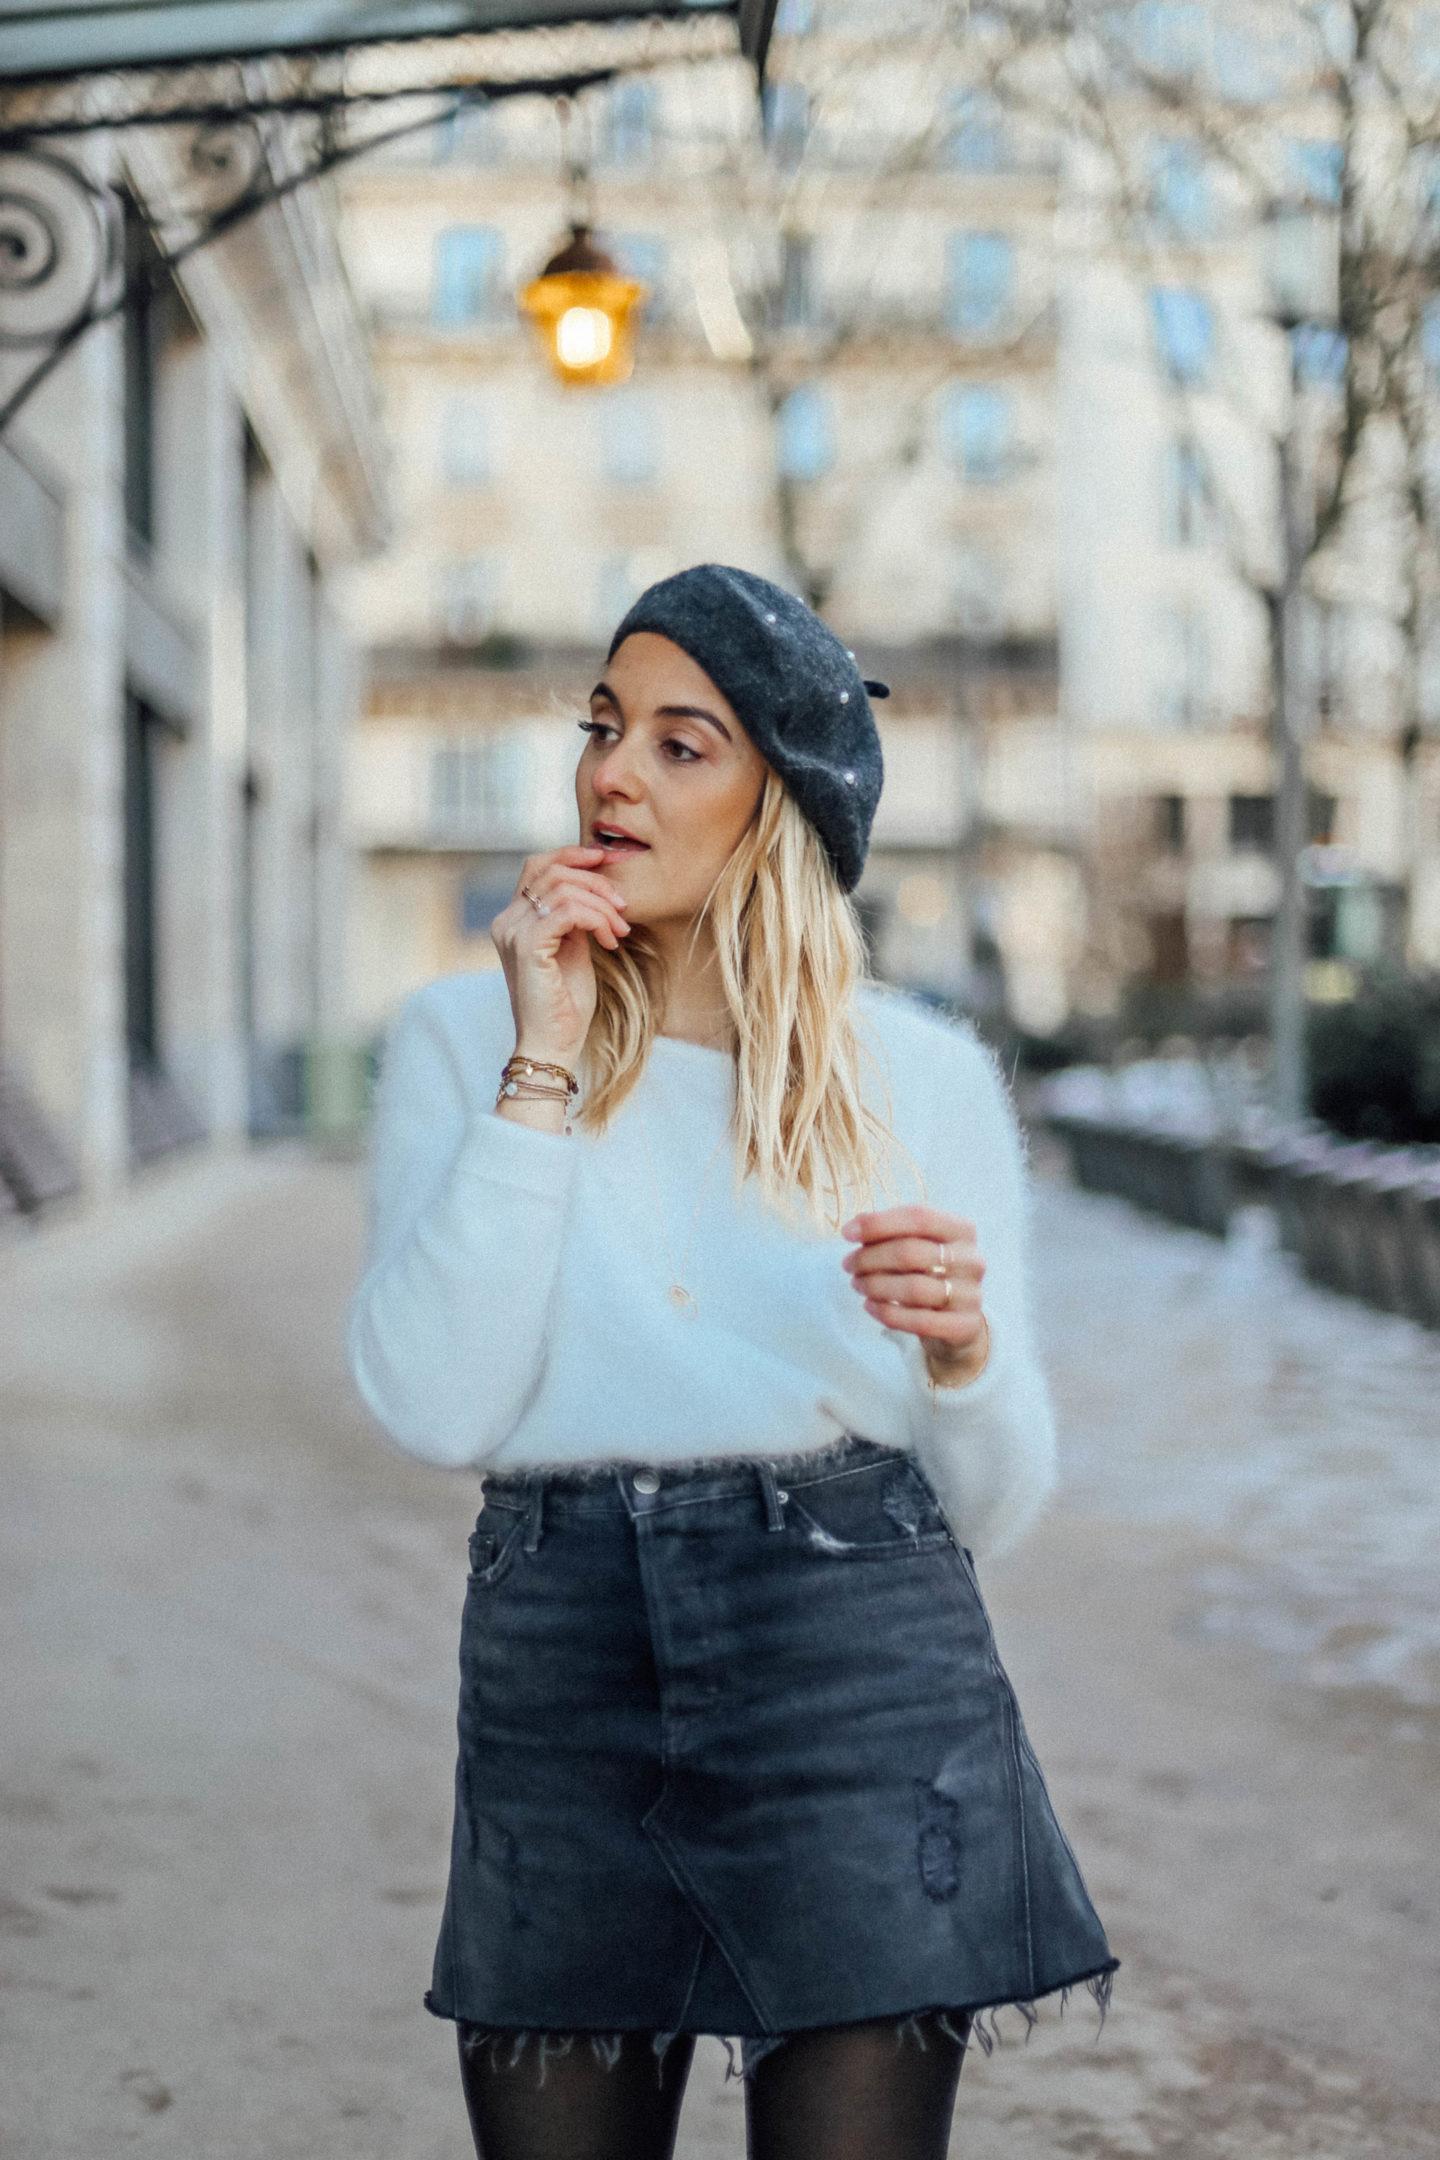 Jupe en denim noire - Blondie Baby blog mode et voyages